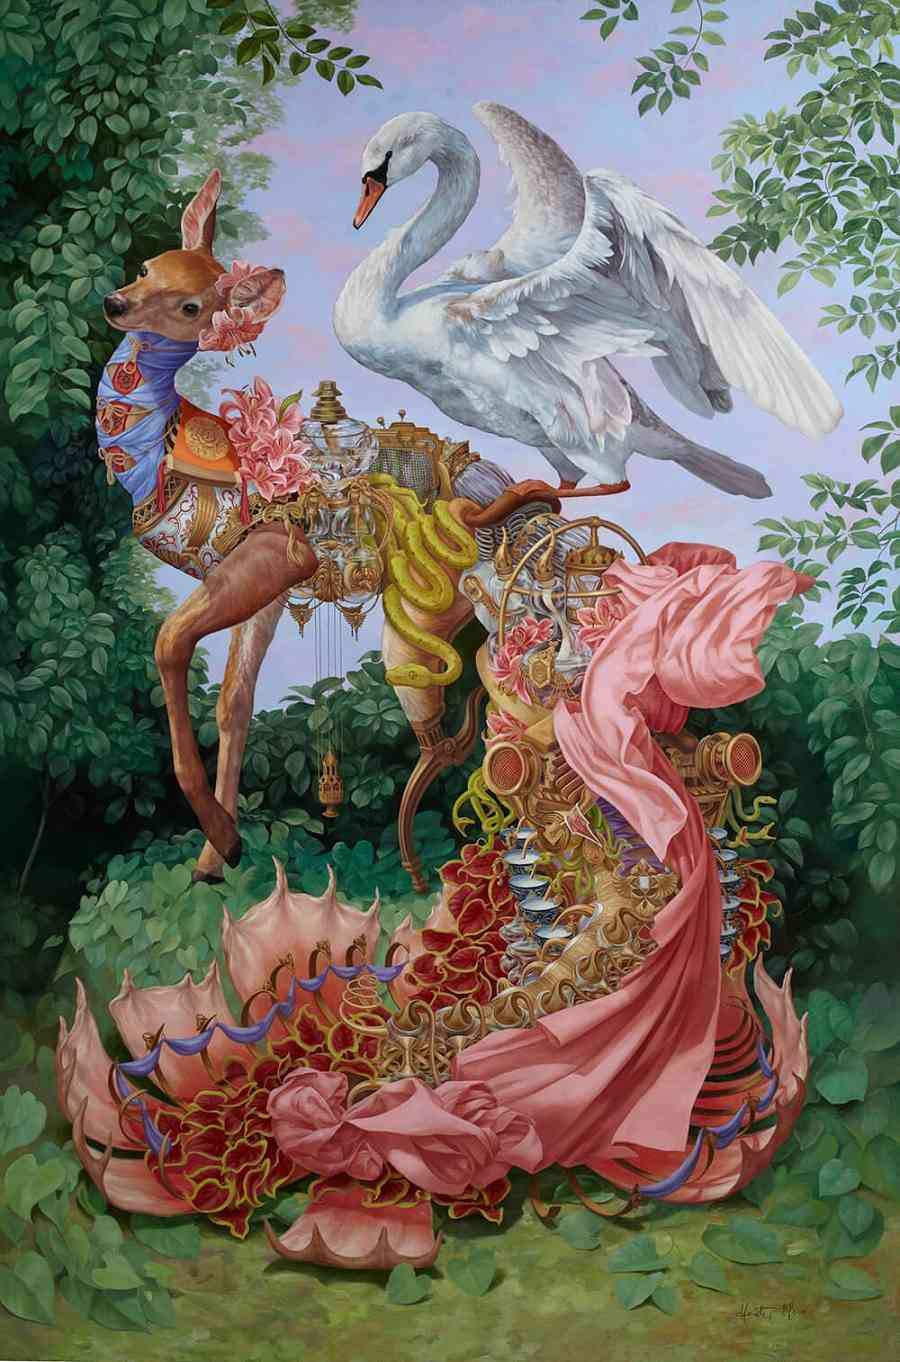 Heidi Taillefer surrealist painting of leda the swan and deer